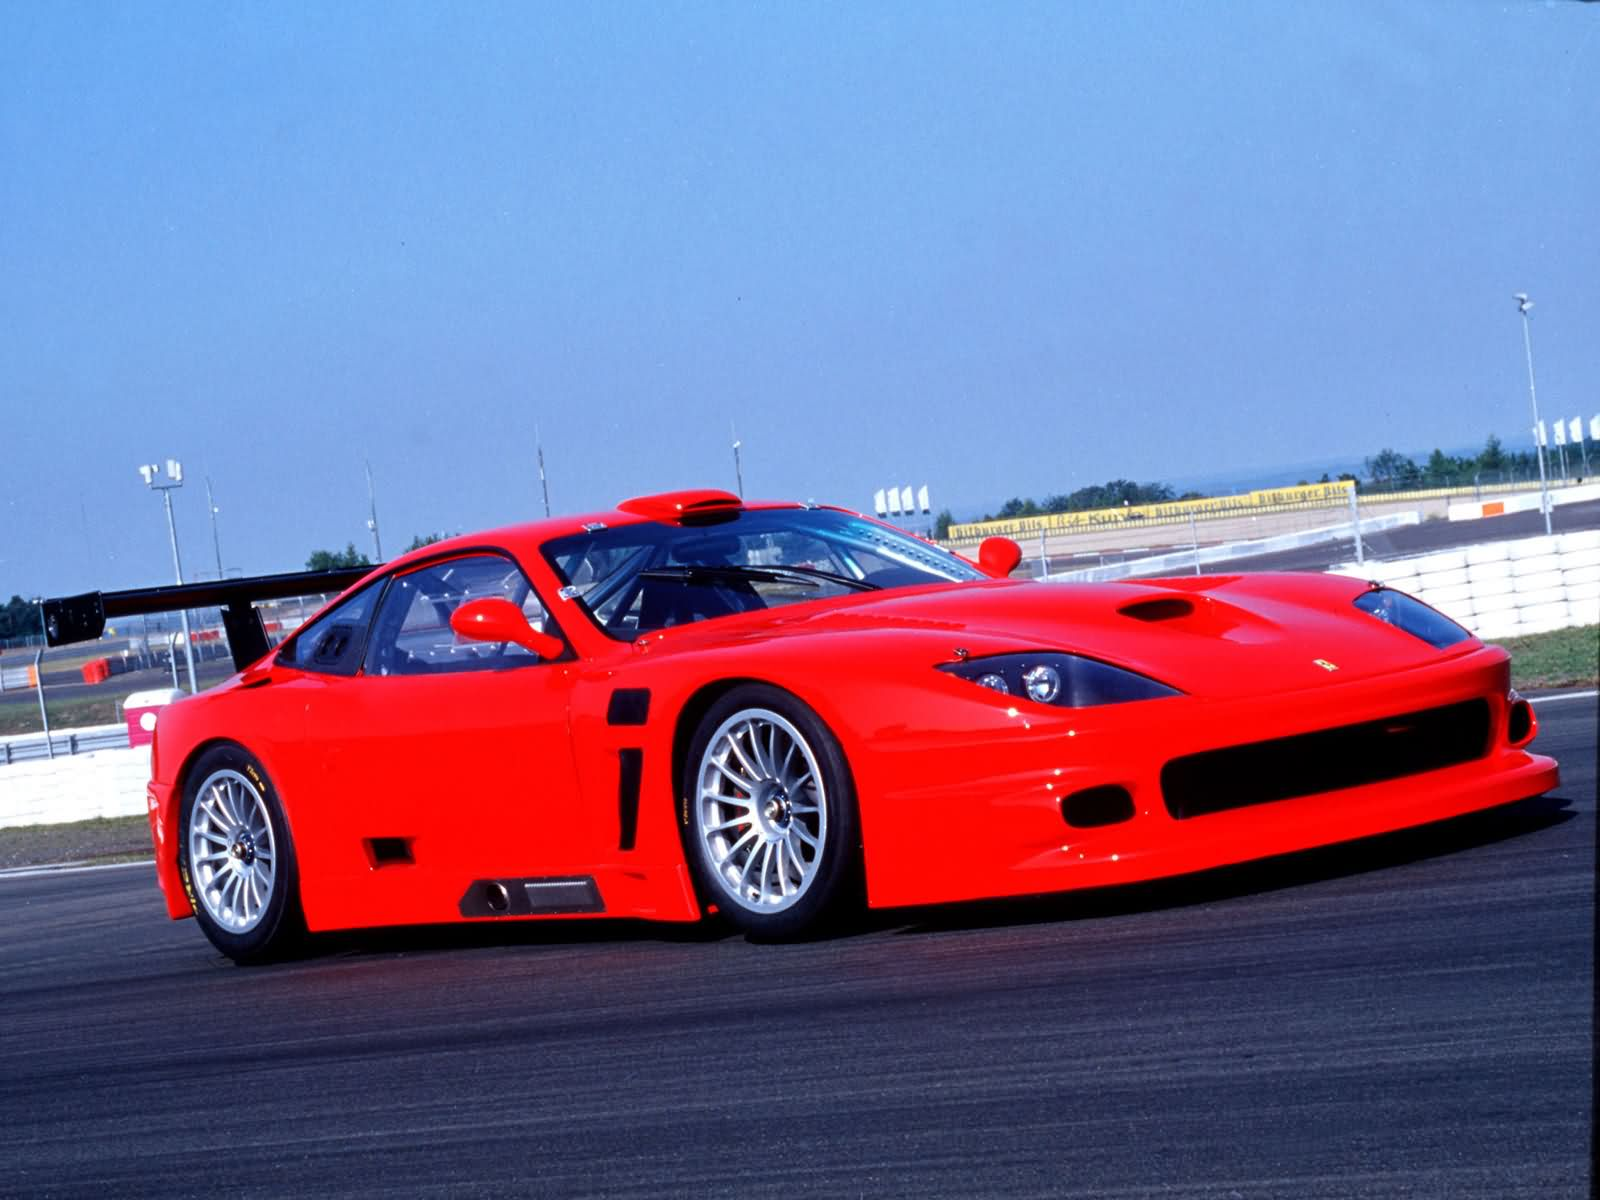 http://www.carsbase.com/photo/Ferrari-575_GTC_mp20_pic_9748.jpg